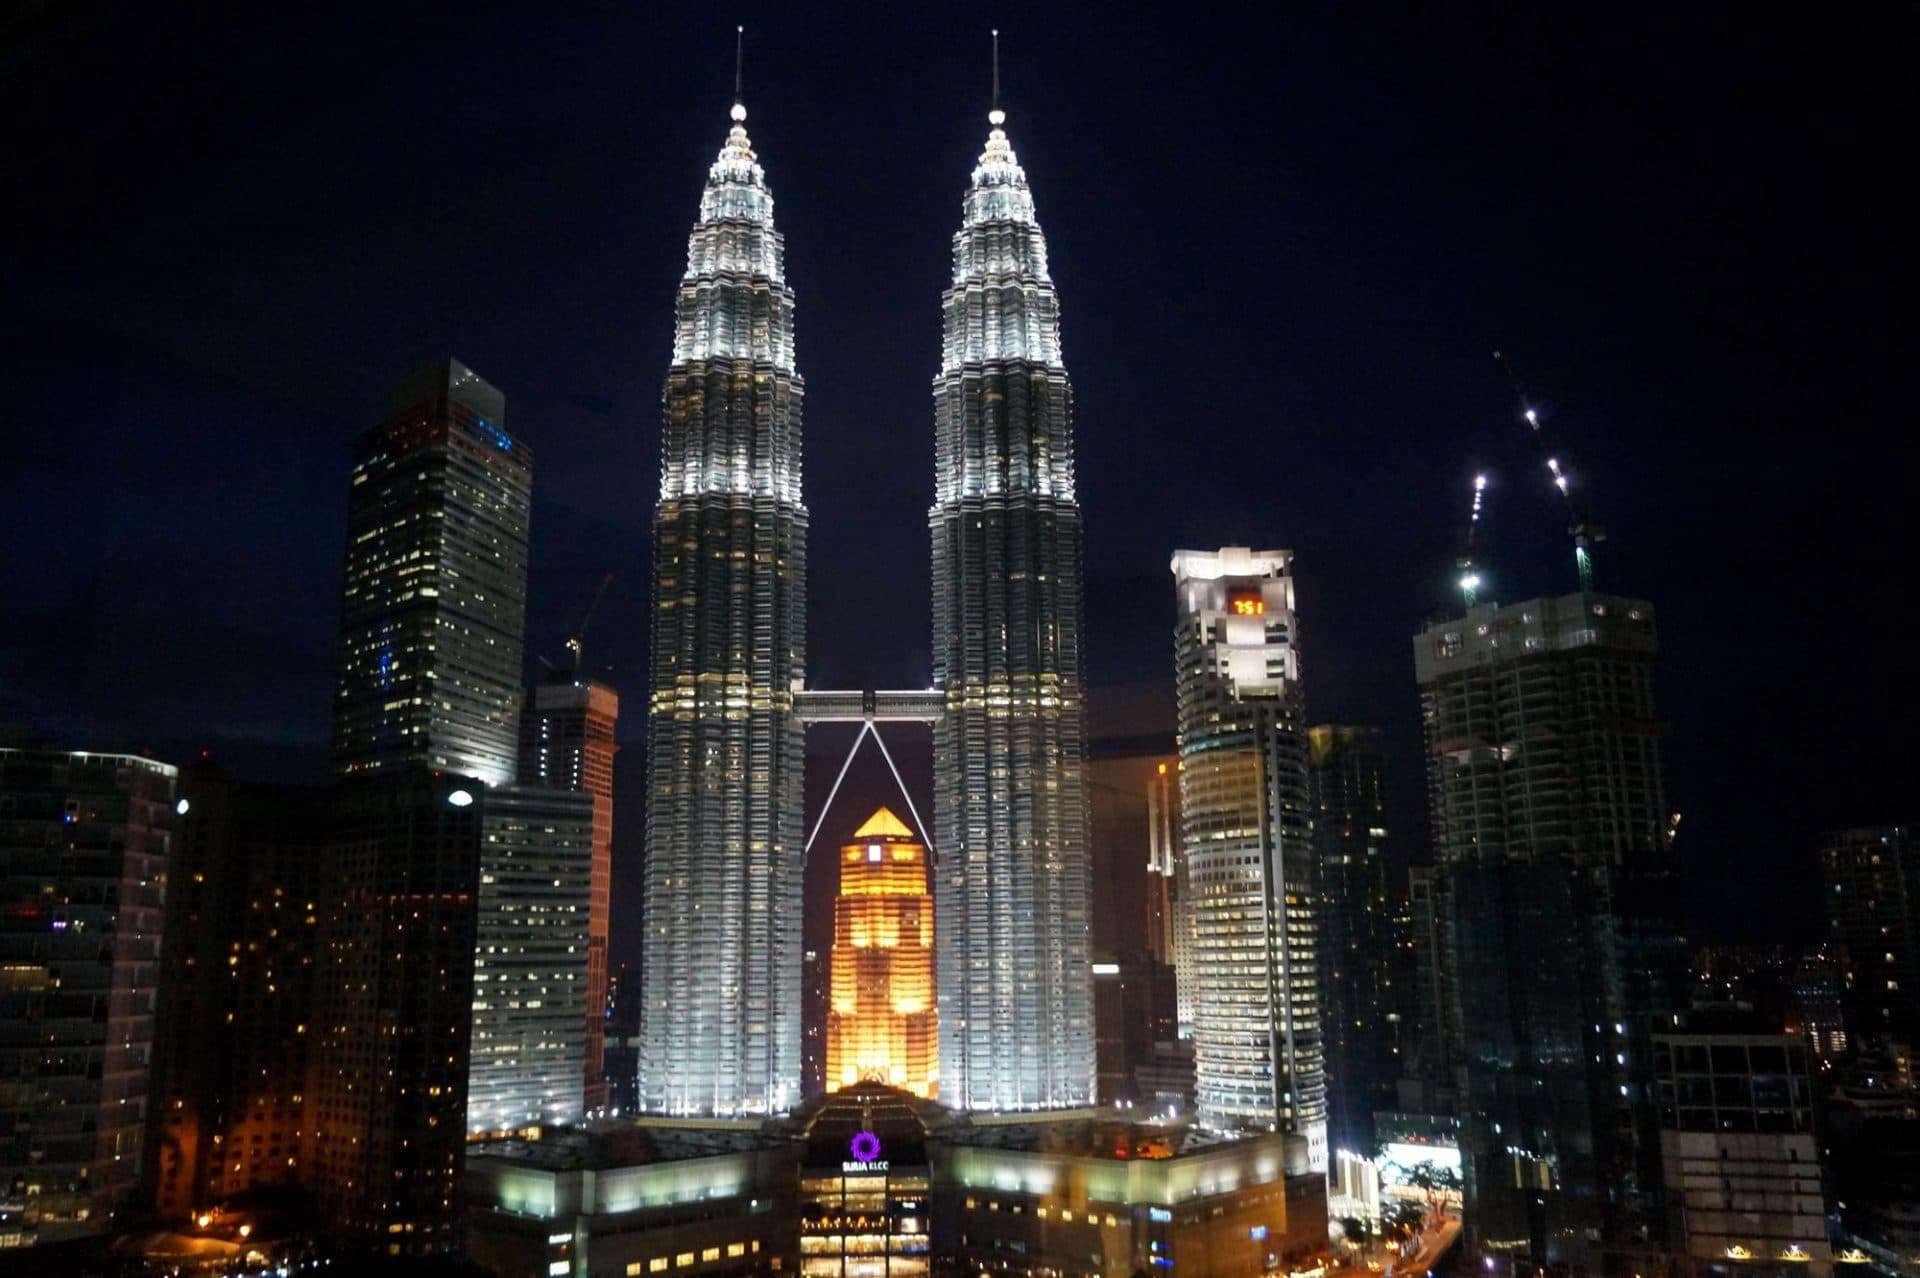 petronas_towers_traders_hotel_kuala_lumpur